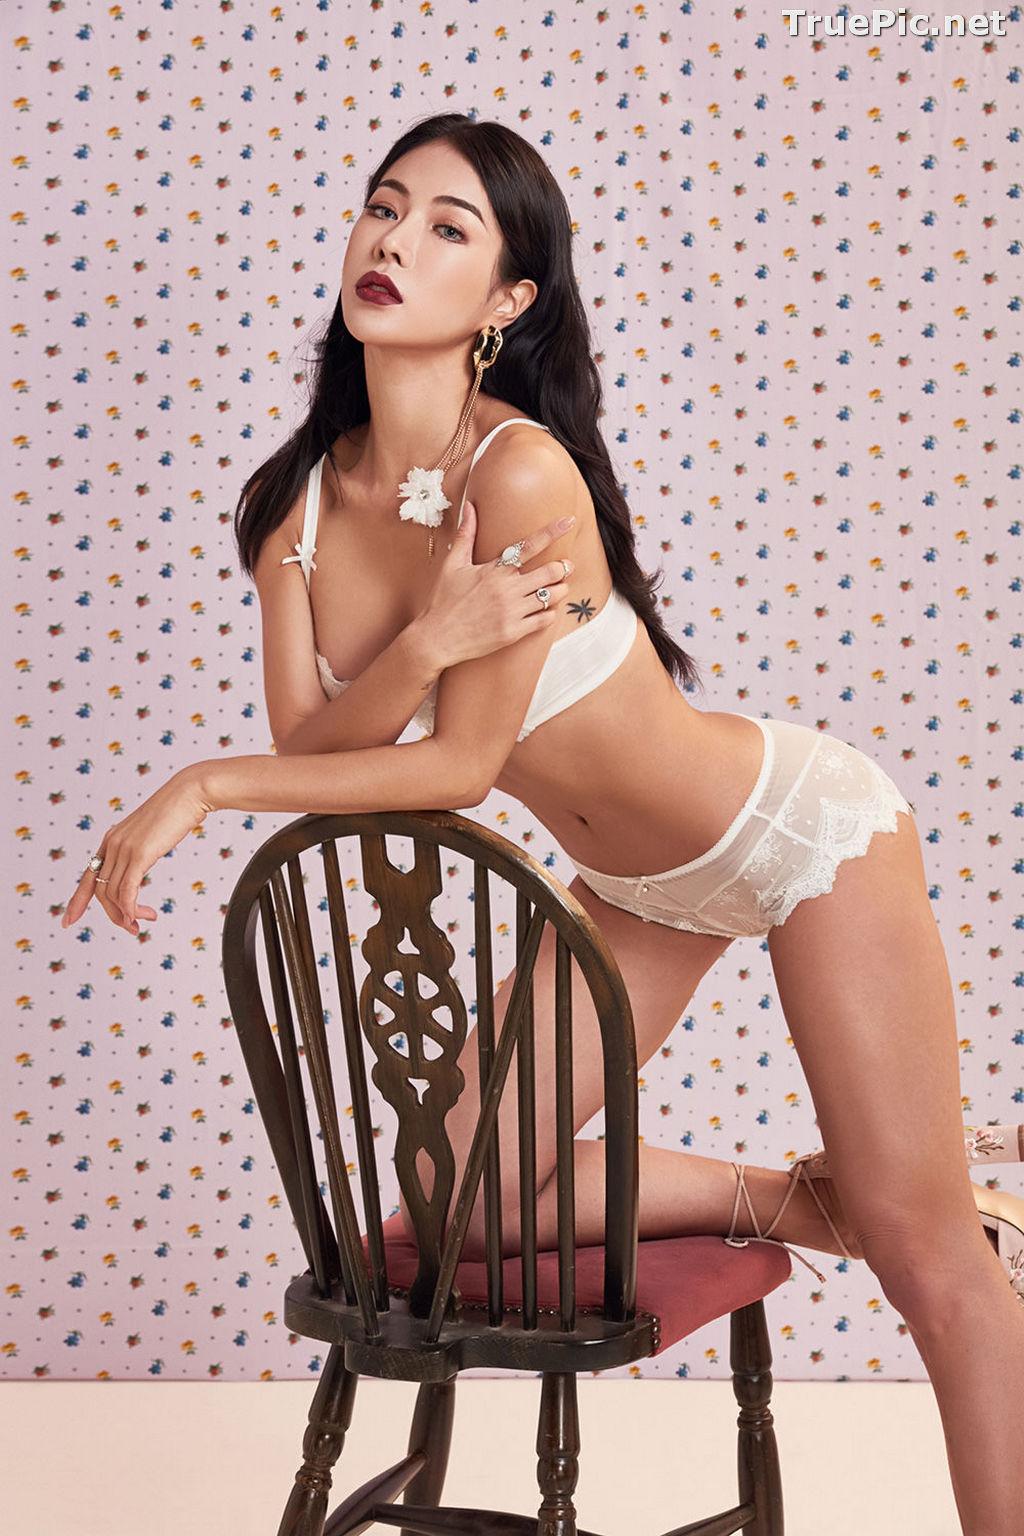 Image Korean Fashion Model - An Seo Rin - White Lingerie and Sleepwear Set - TruePic.net - Picture-8